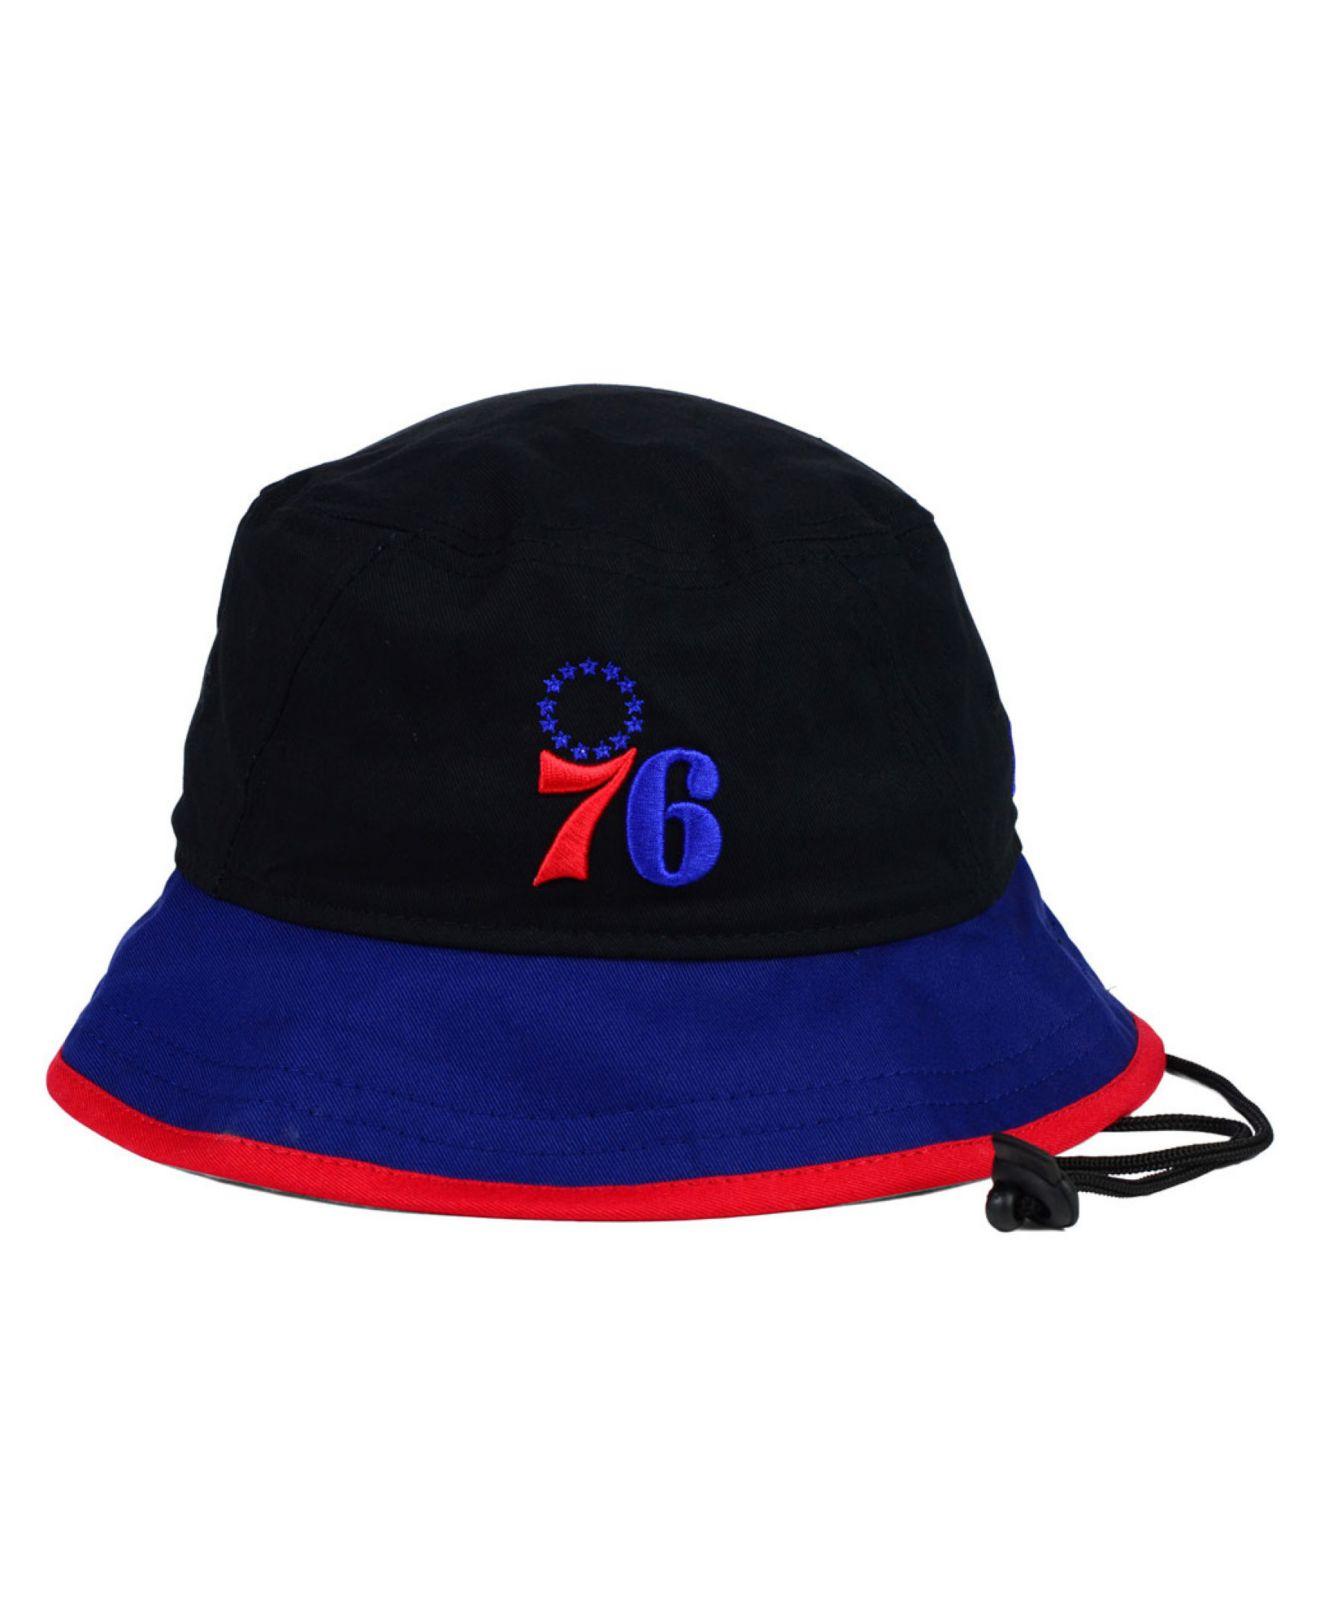 43d4ea72e inexpensive philadelphia 76ers bucket hat 97c53 3c871